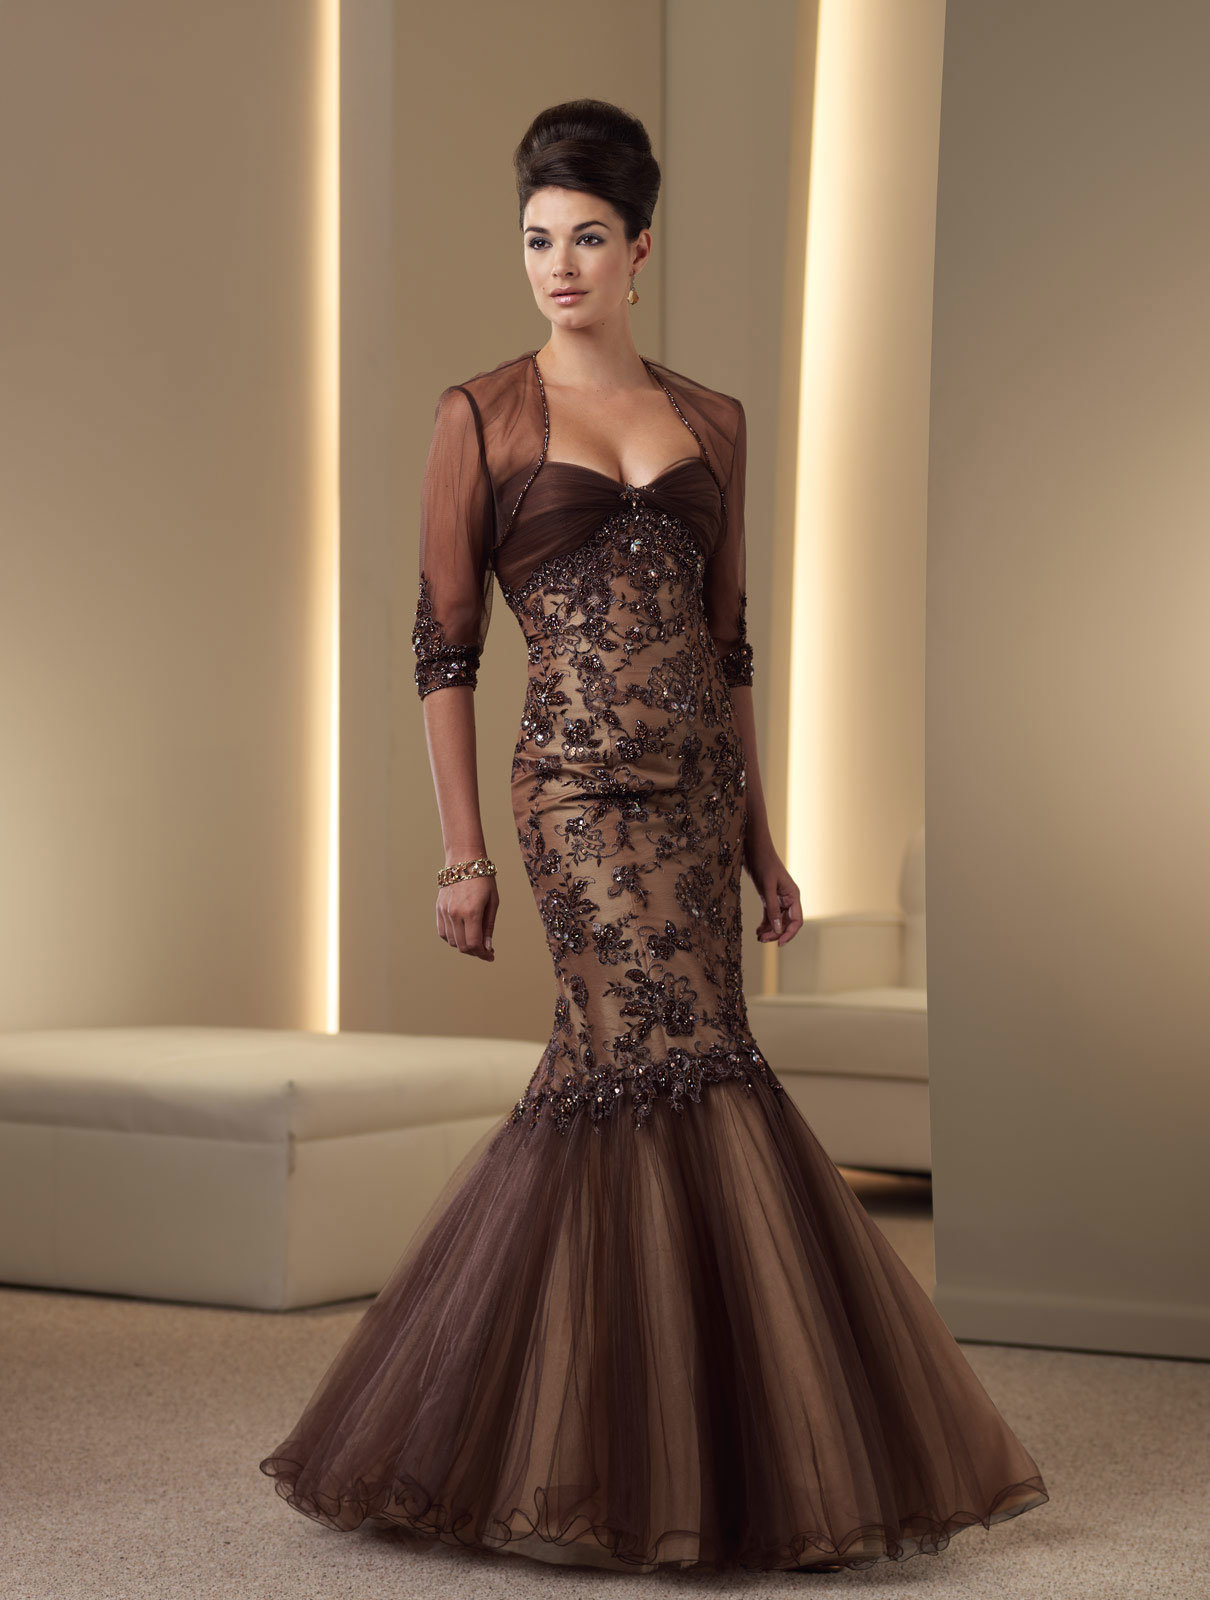 Skyonline International Pakistan: Dress The Bride